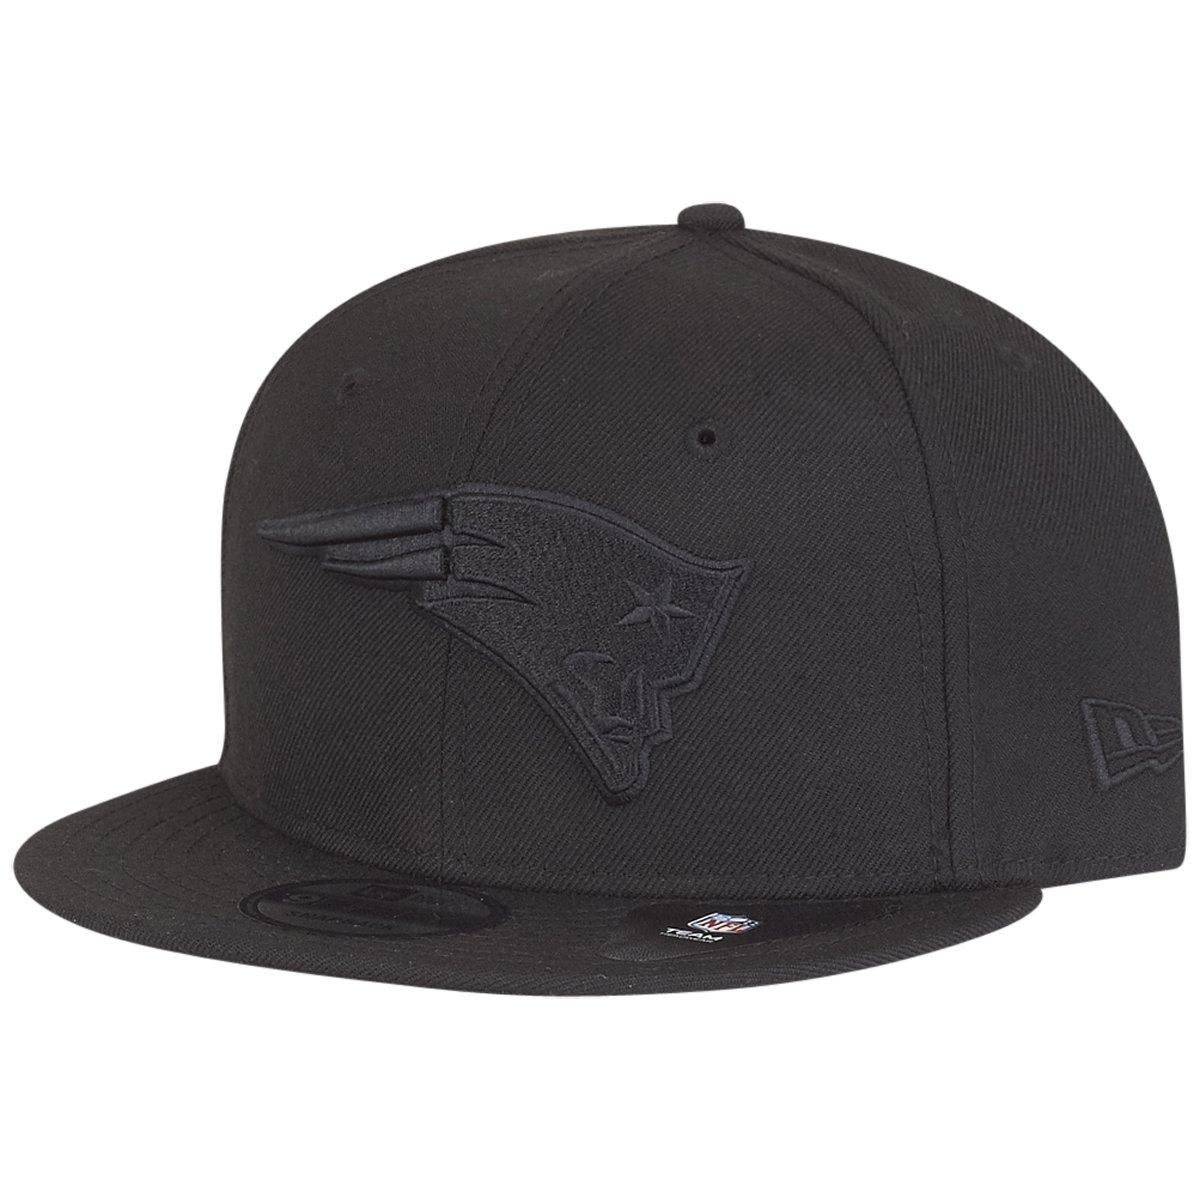 New Era 9Fifty Snapback Cap - New England Patriots schwarz | eBay